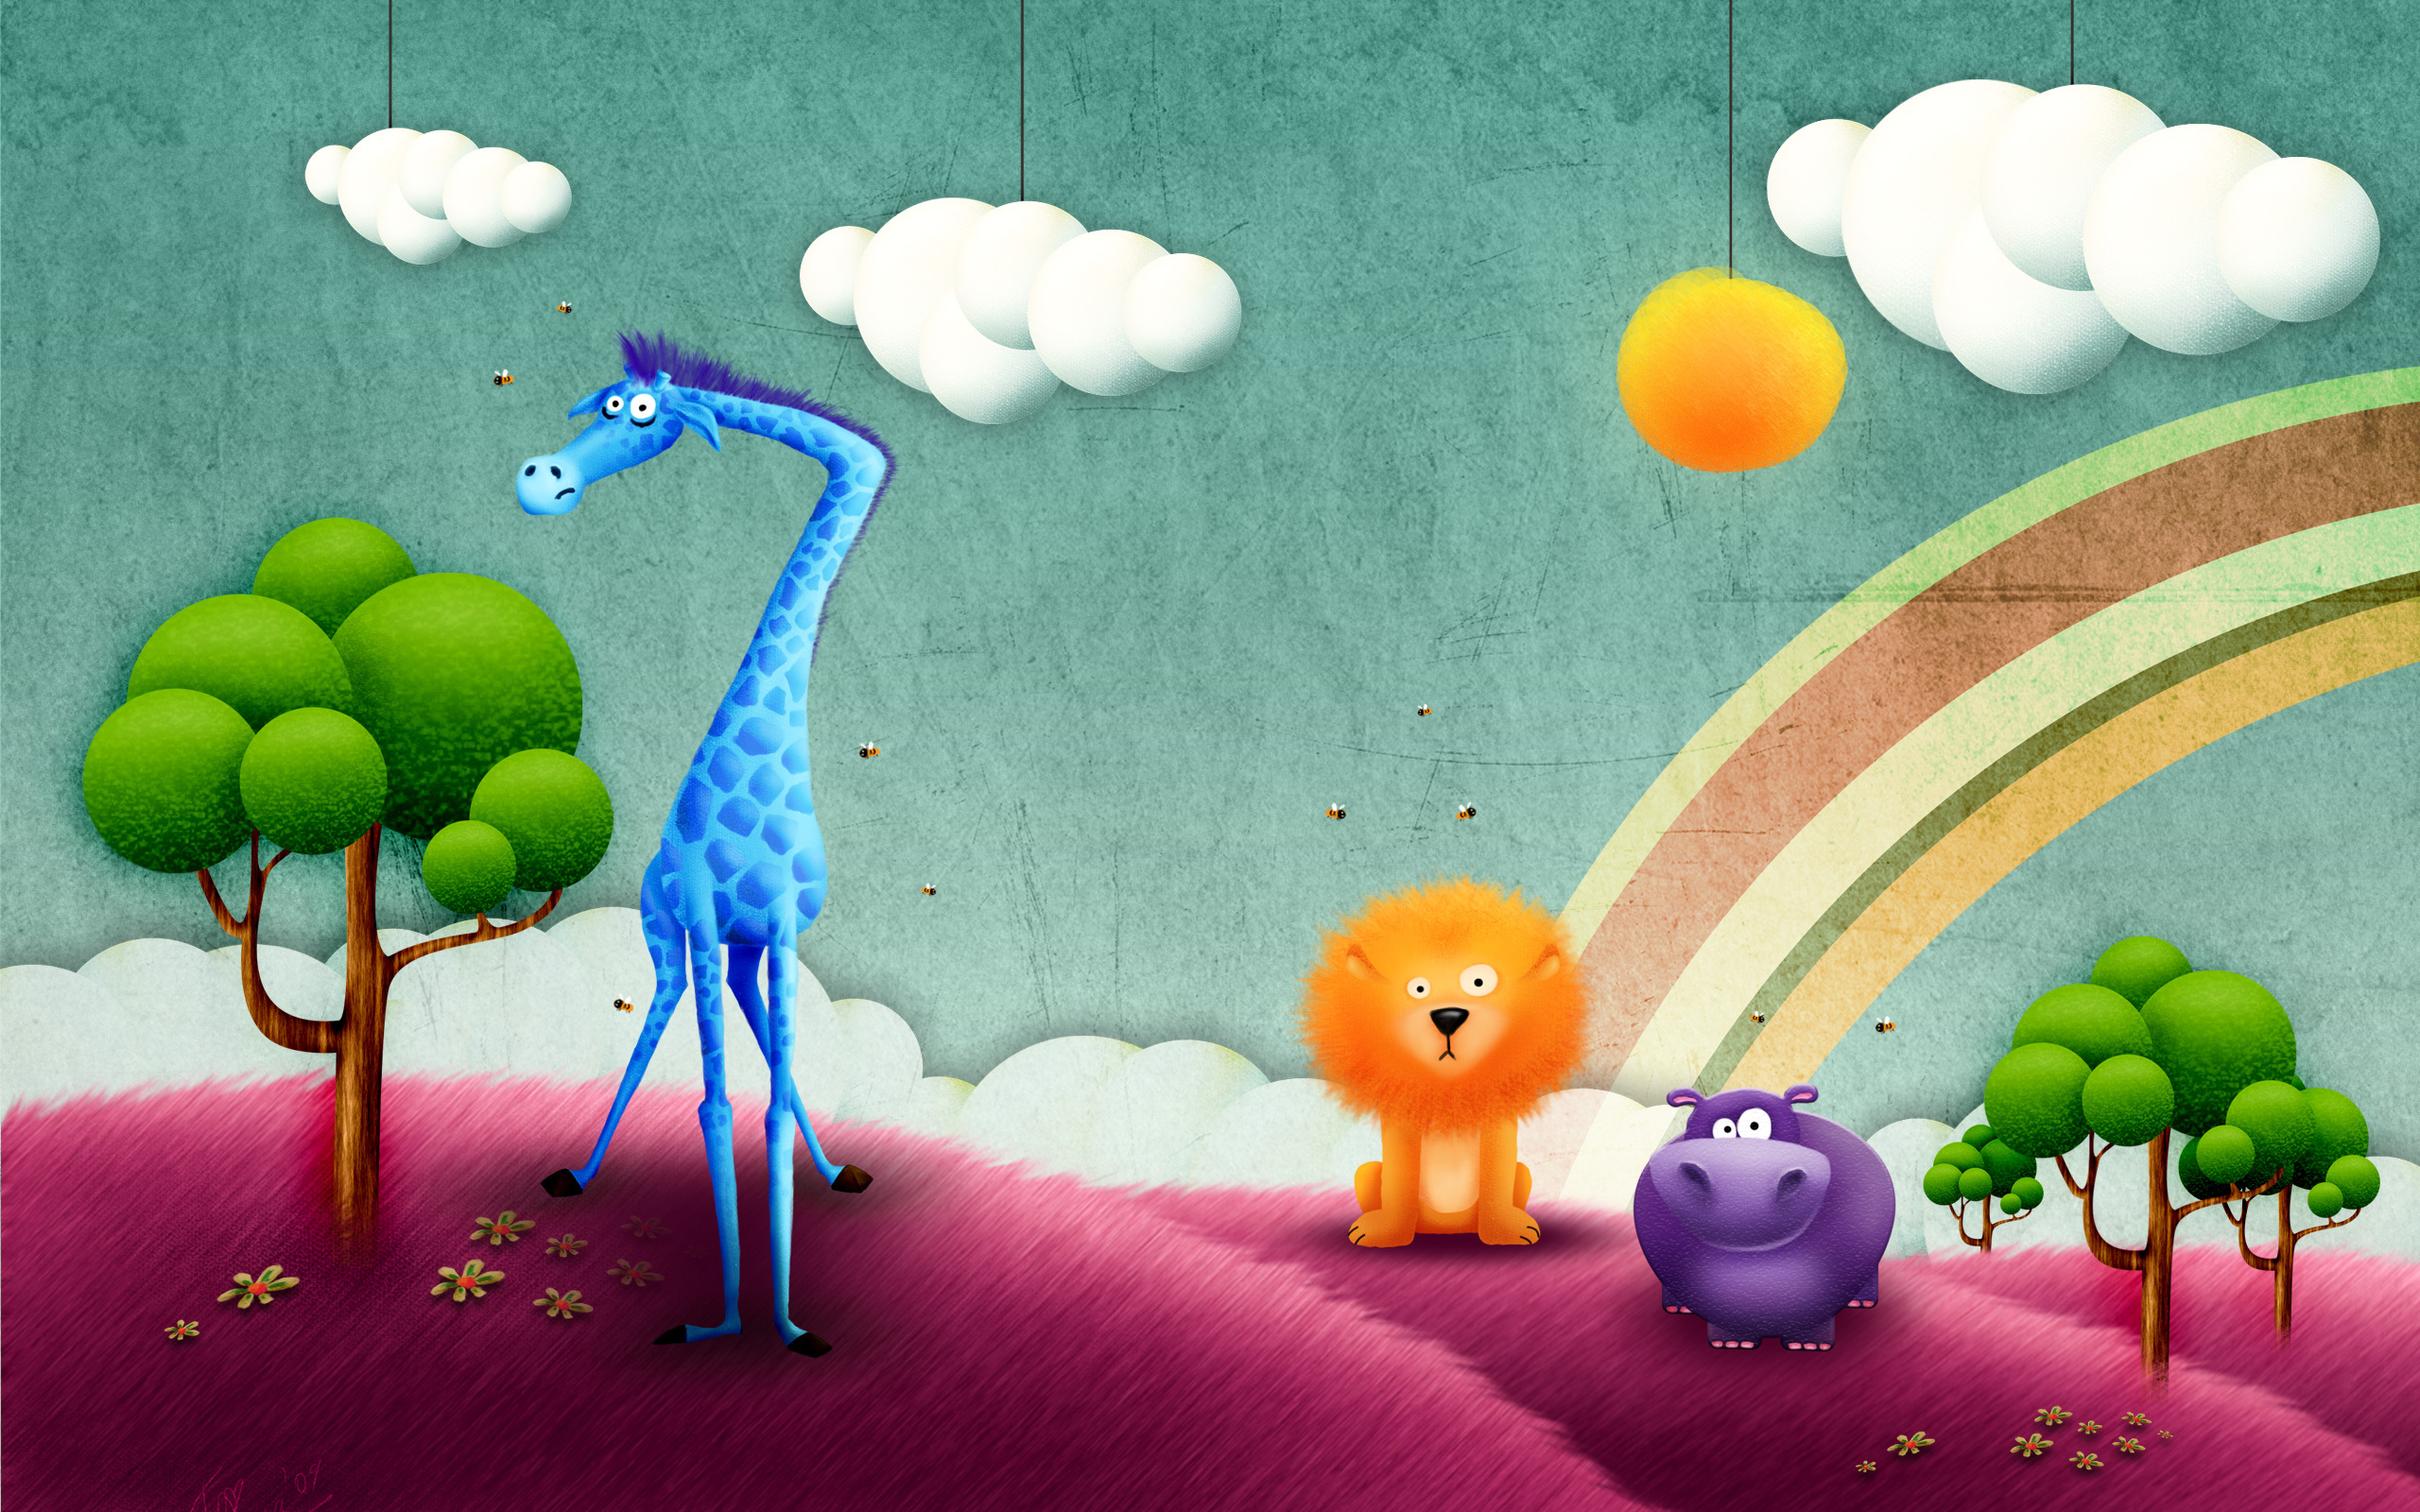 жираф вода юмор без смс